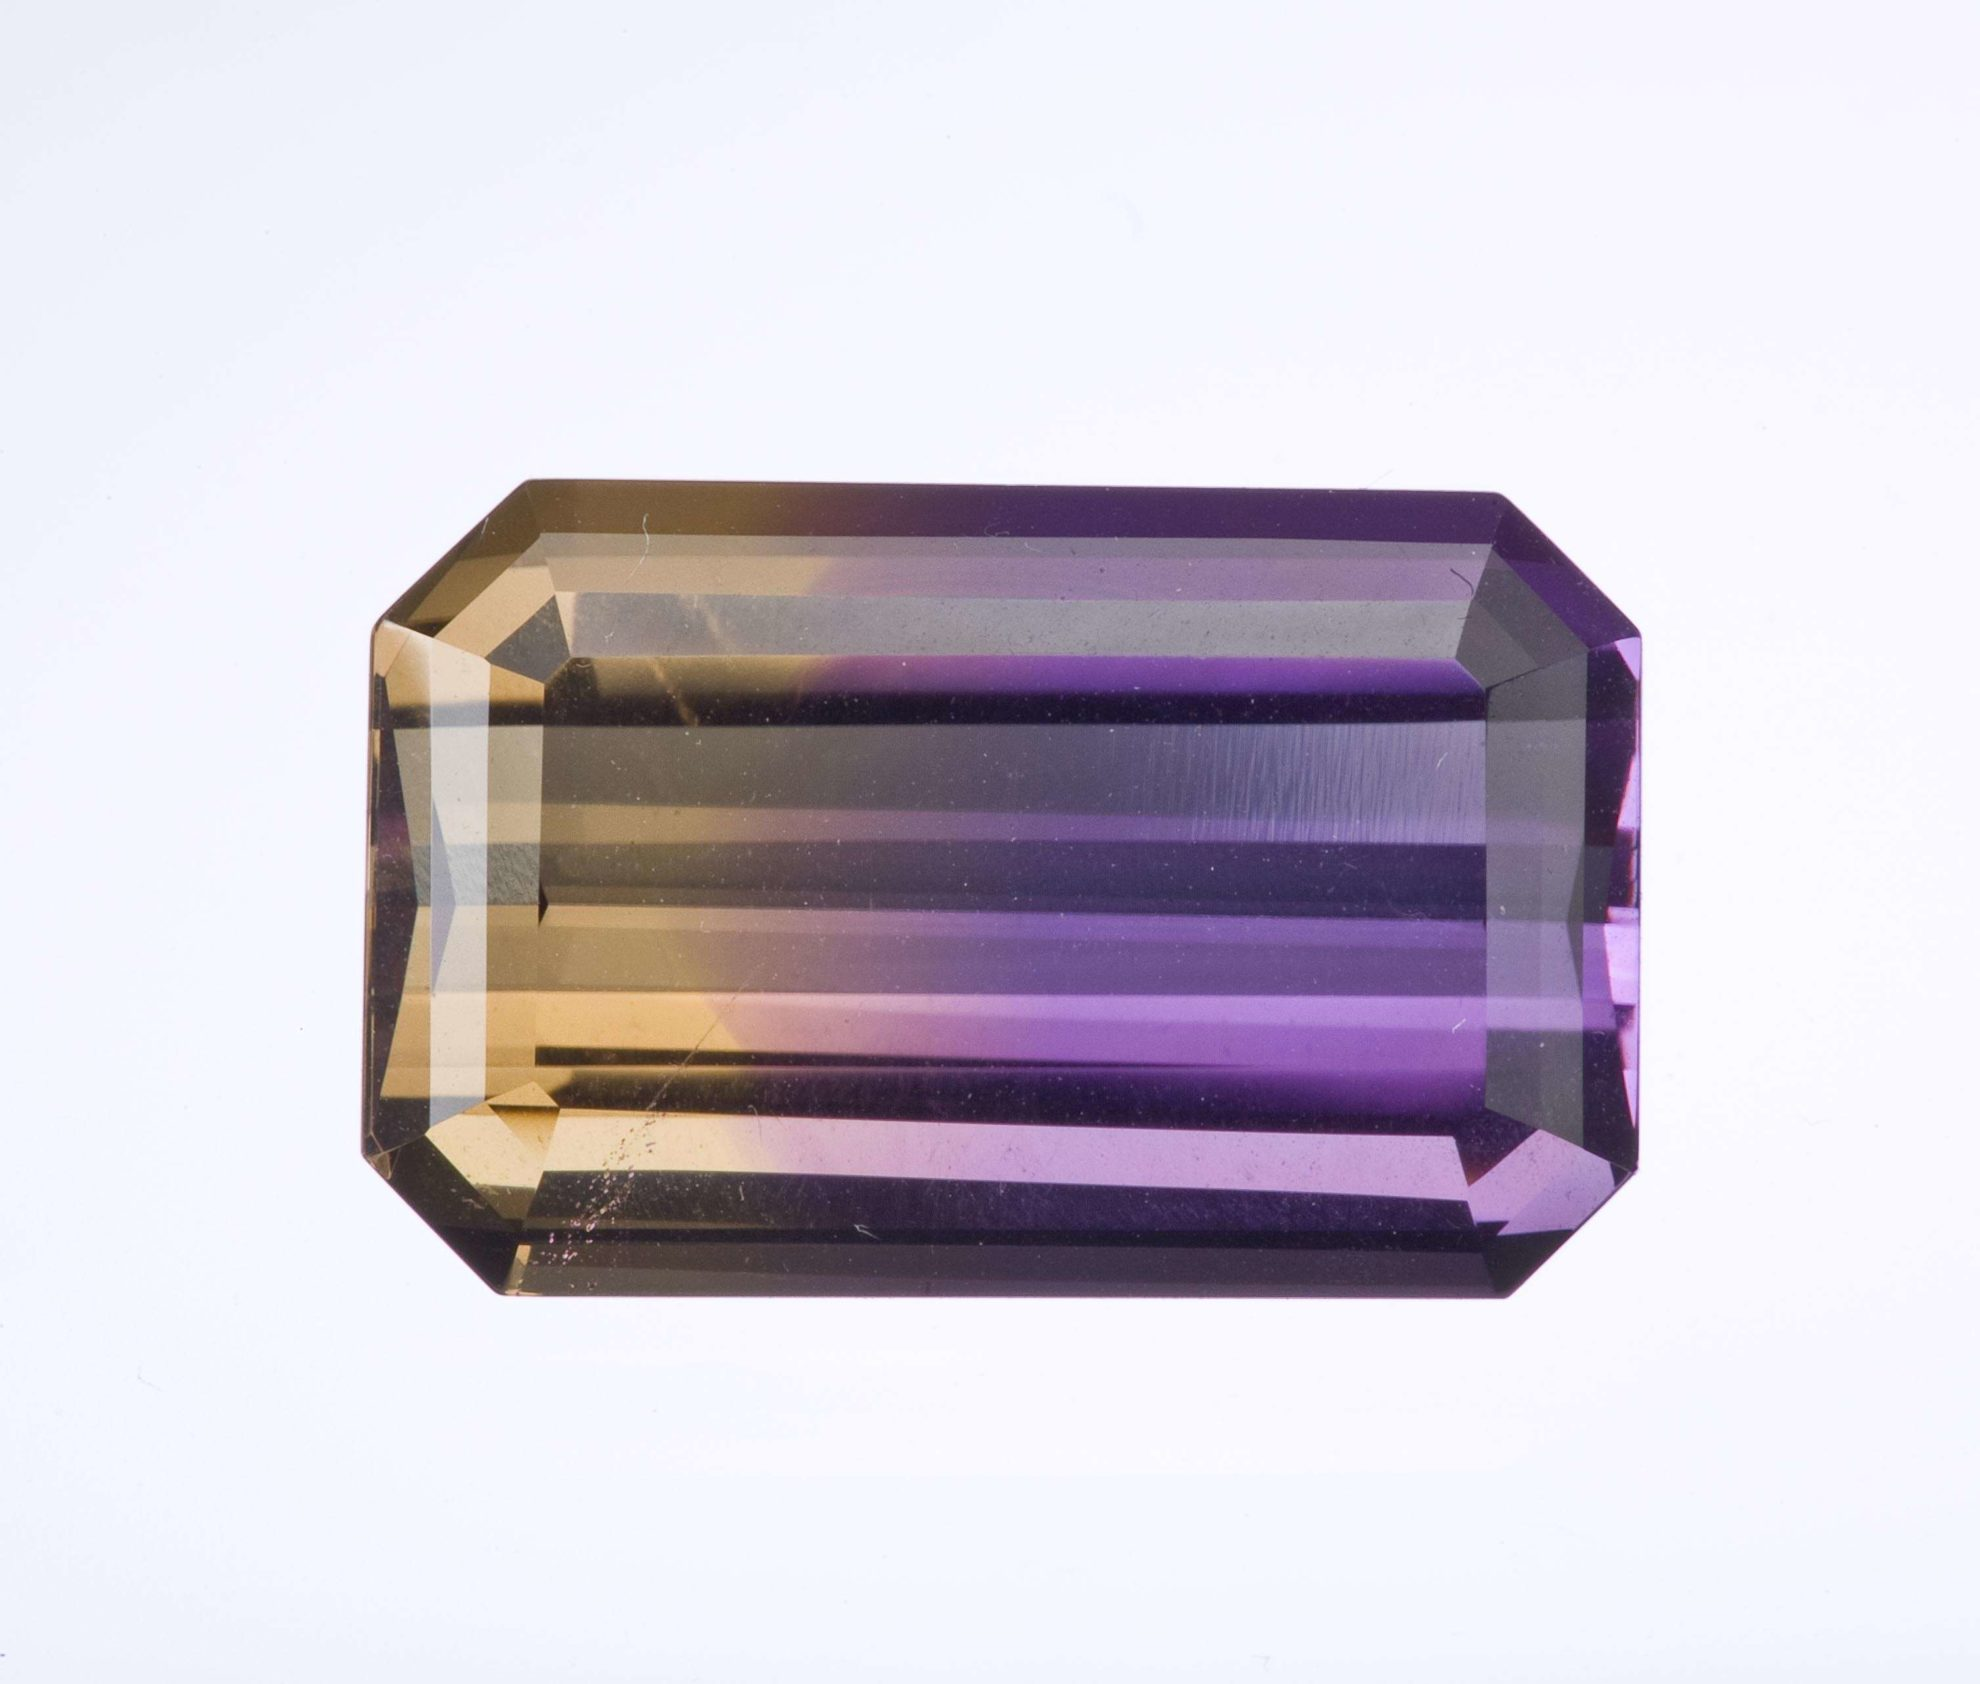 Natural ametrine  gemstonetop quality faceted ametrine loose stonegenuine ametrine for jewelryametrine gem stone 10x14mm